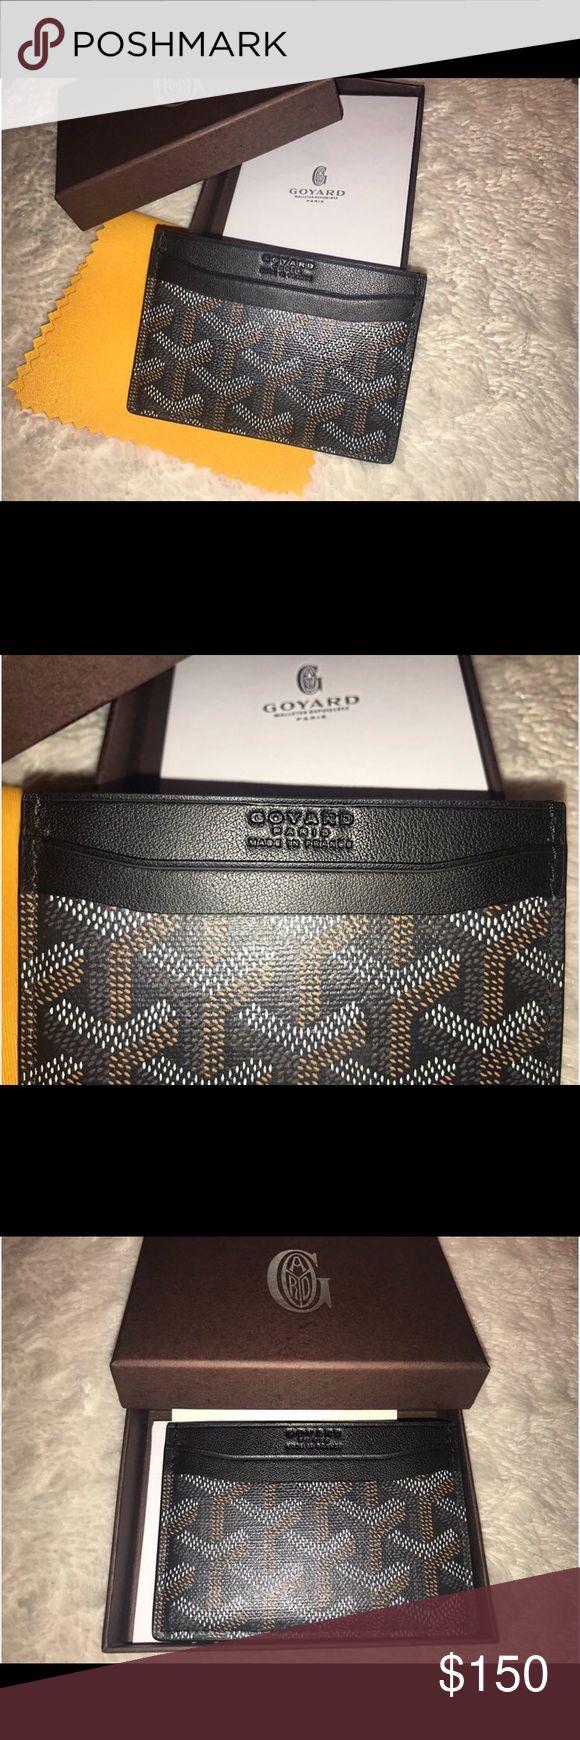 Goyard card case Goyard card holder, great price, great quality, never used! Goyard Accessories Key & Card Holders